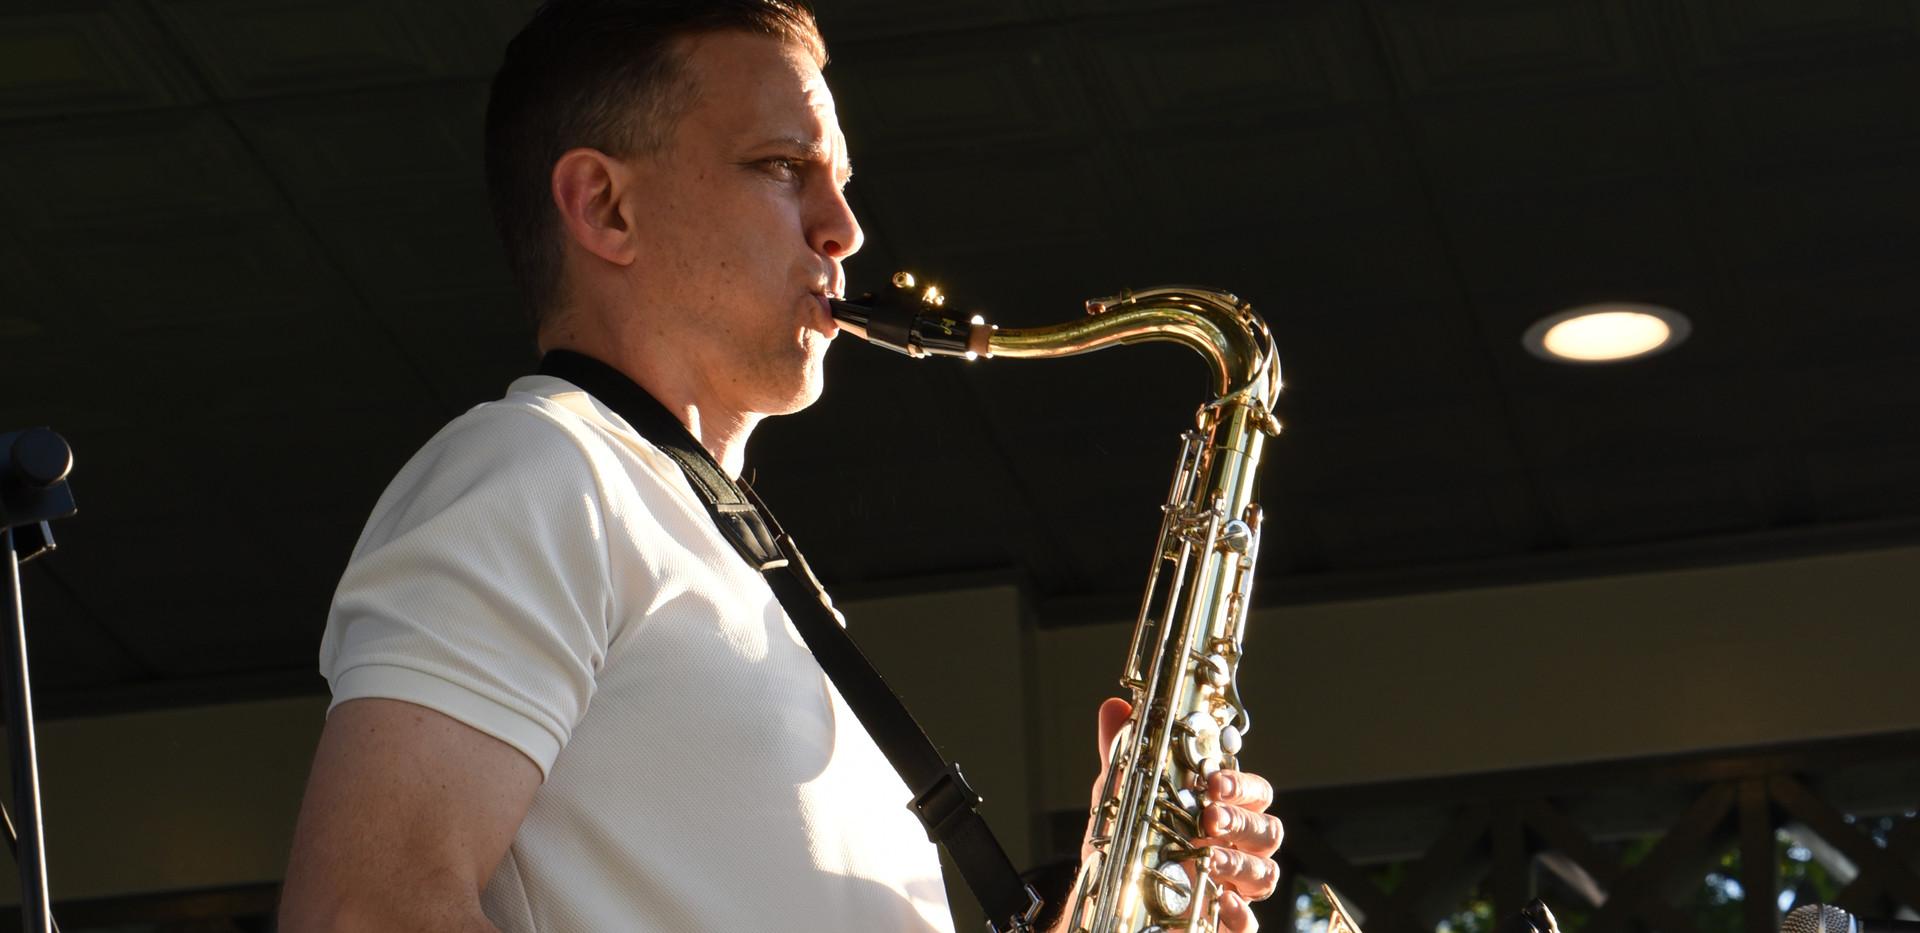 Havana NRG horn section